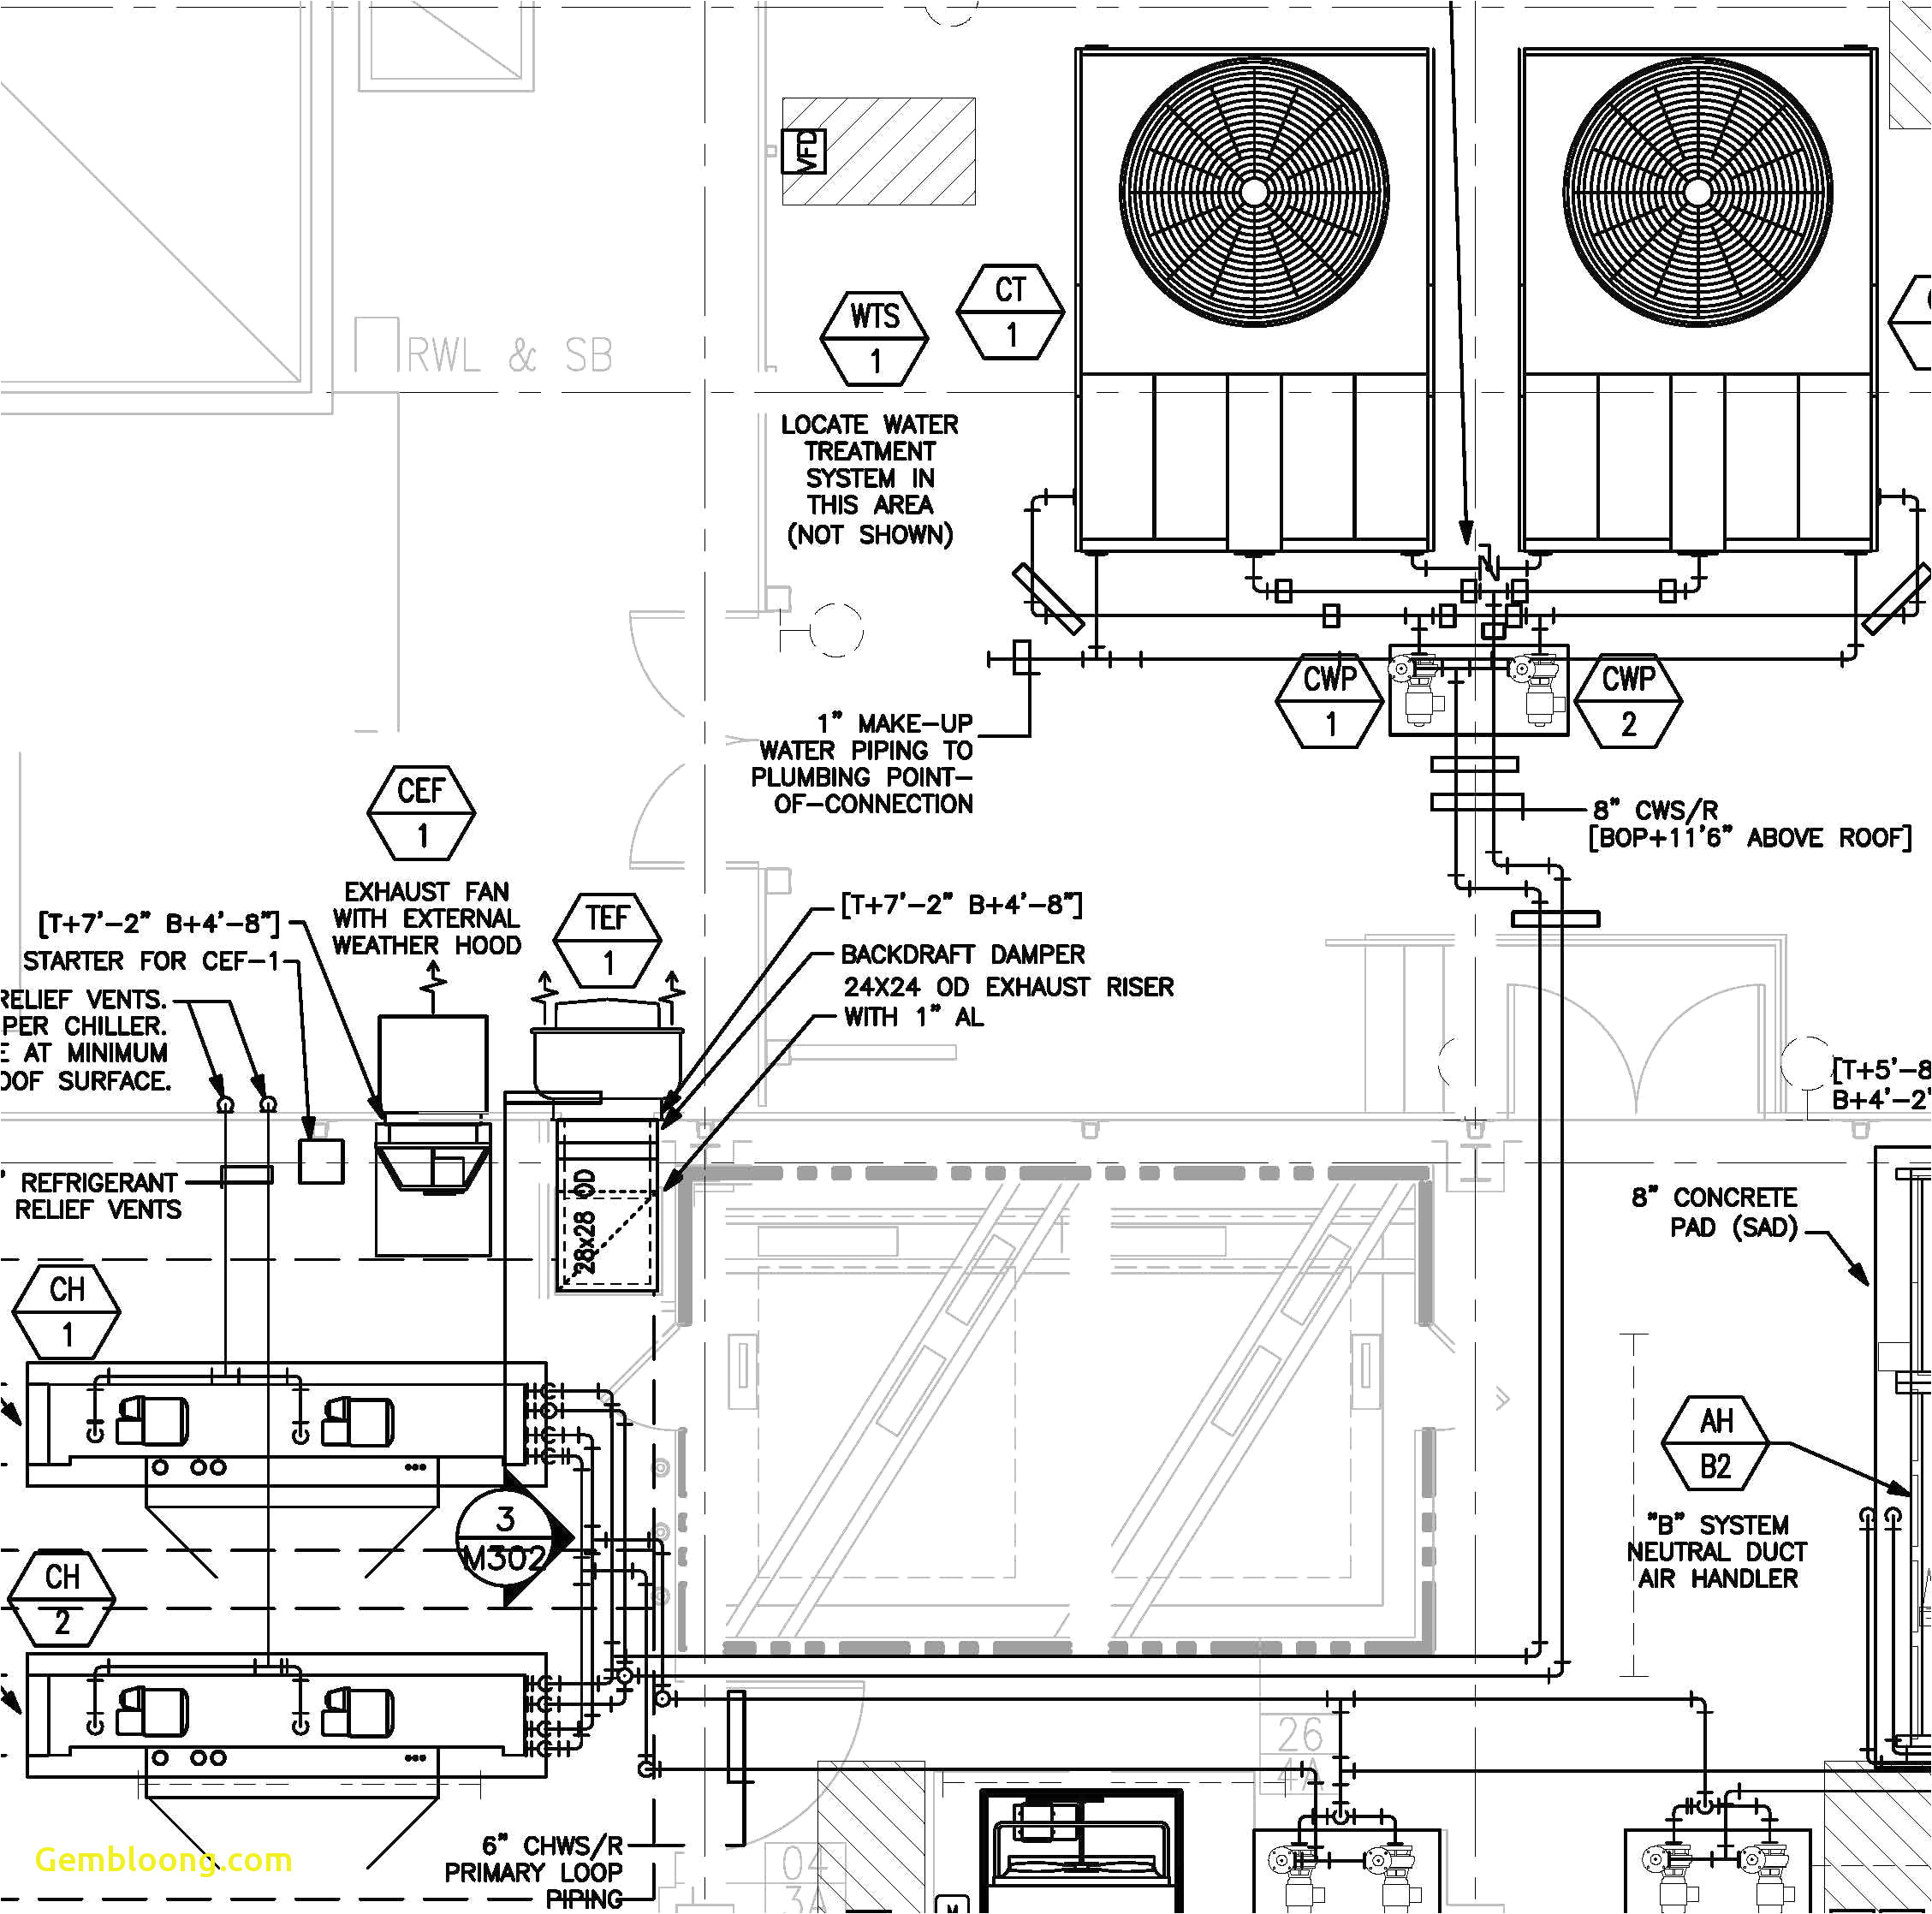 freightliner m2 wiring diagram u2013 manufacturingengineering orgdownload freightliner m2 wiring diagram